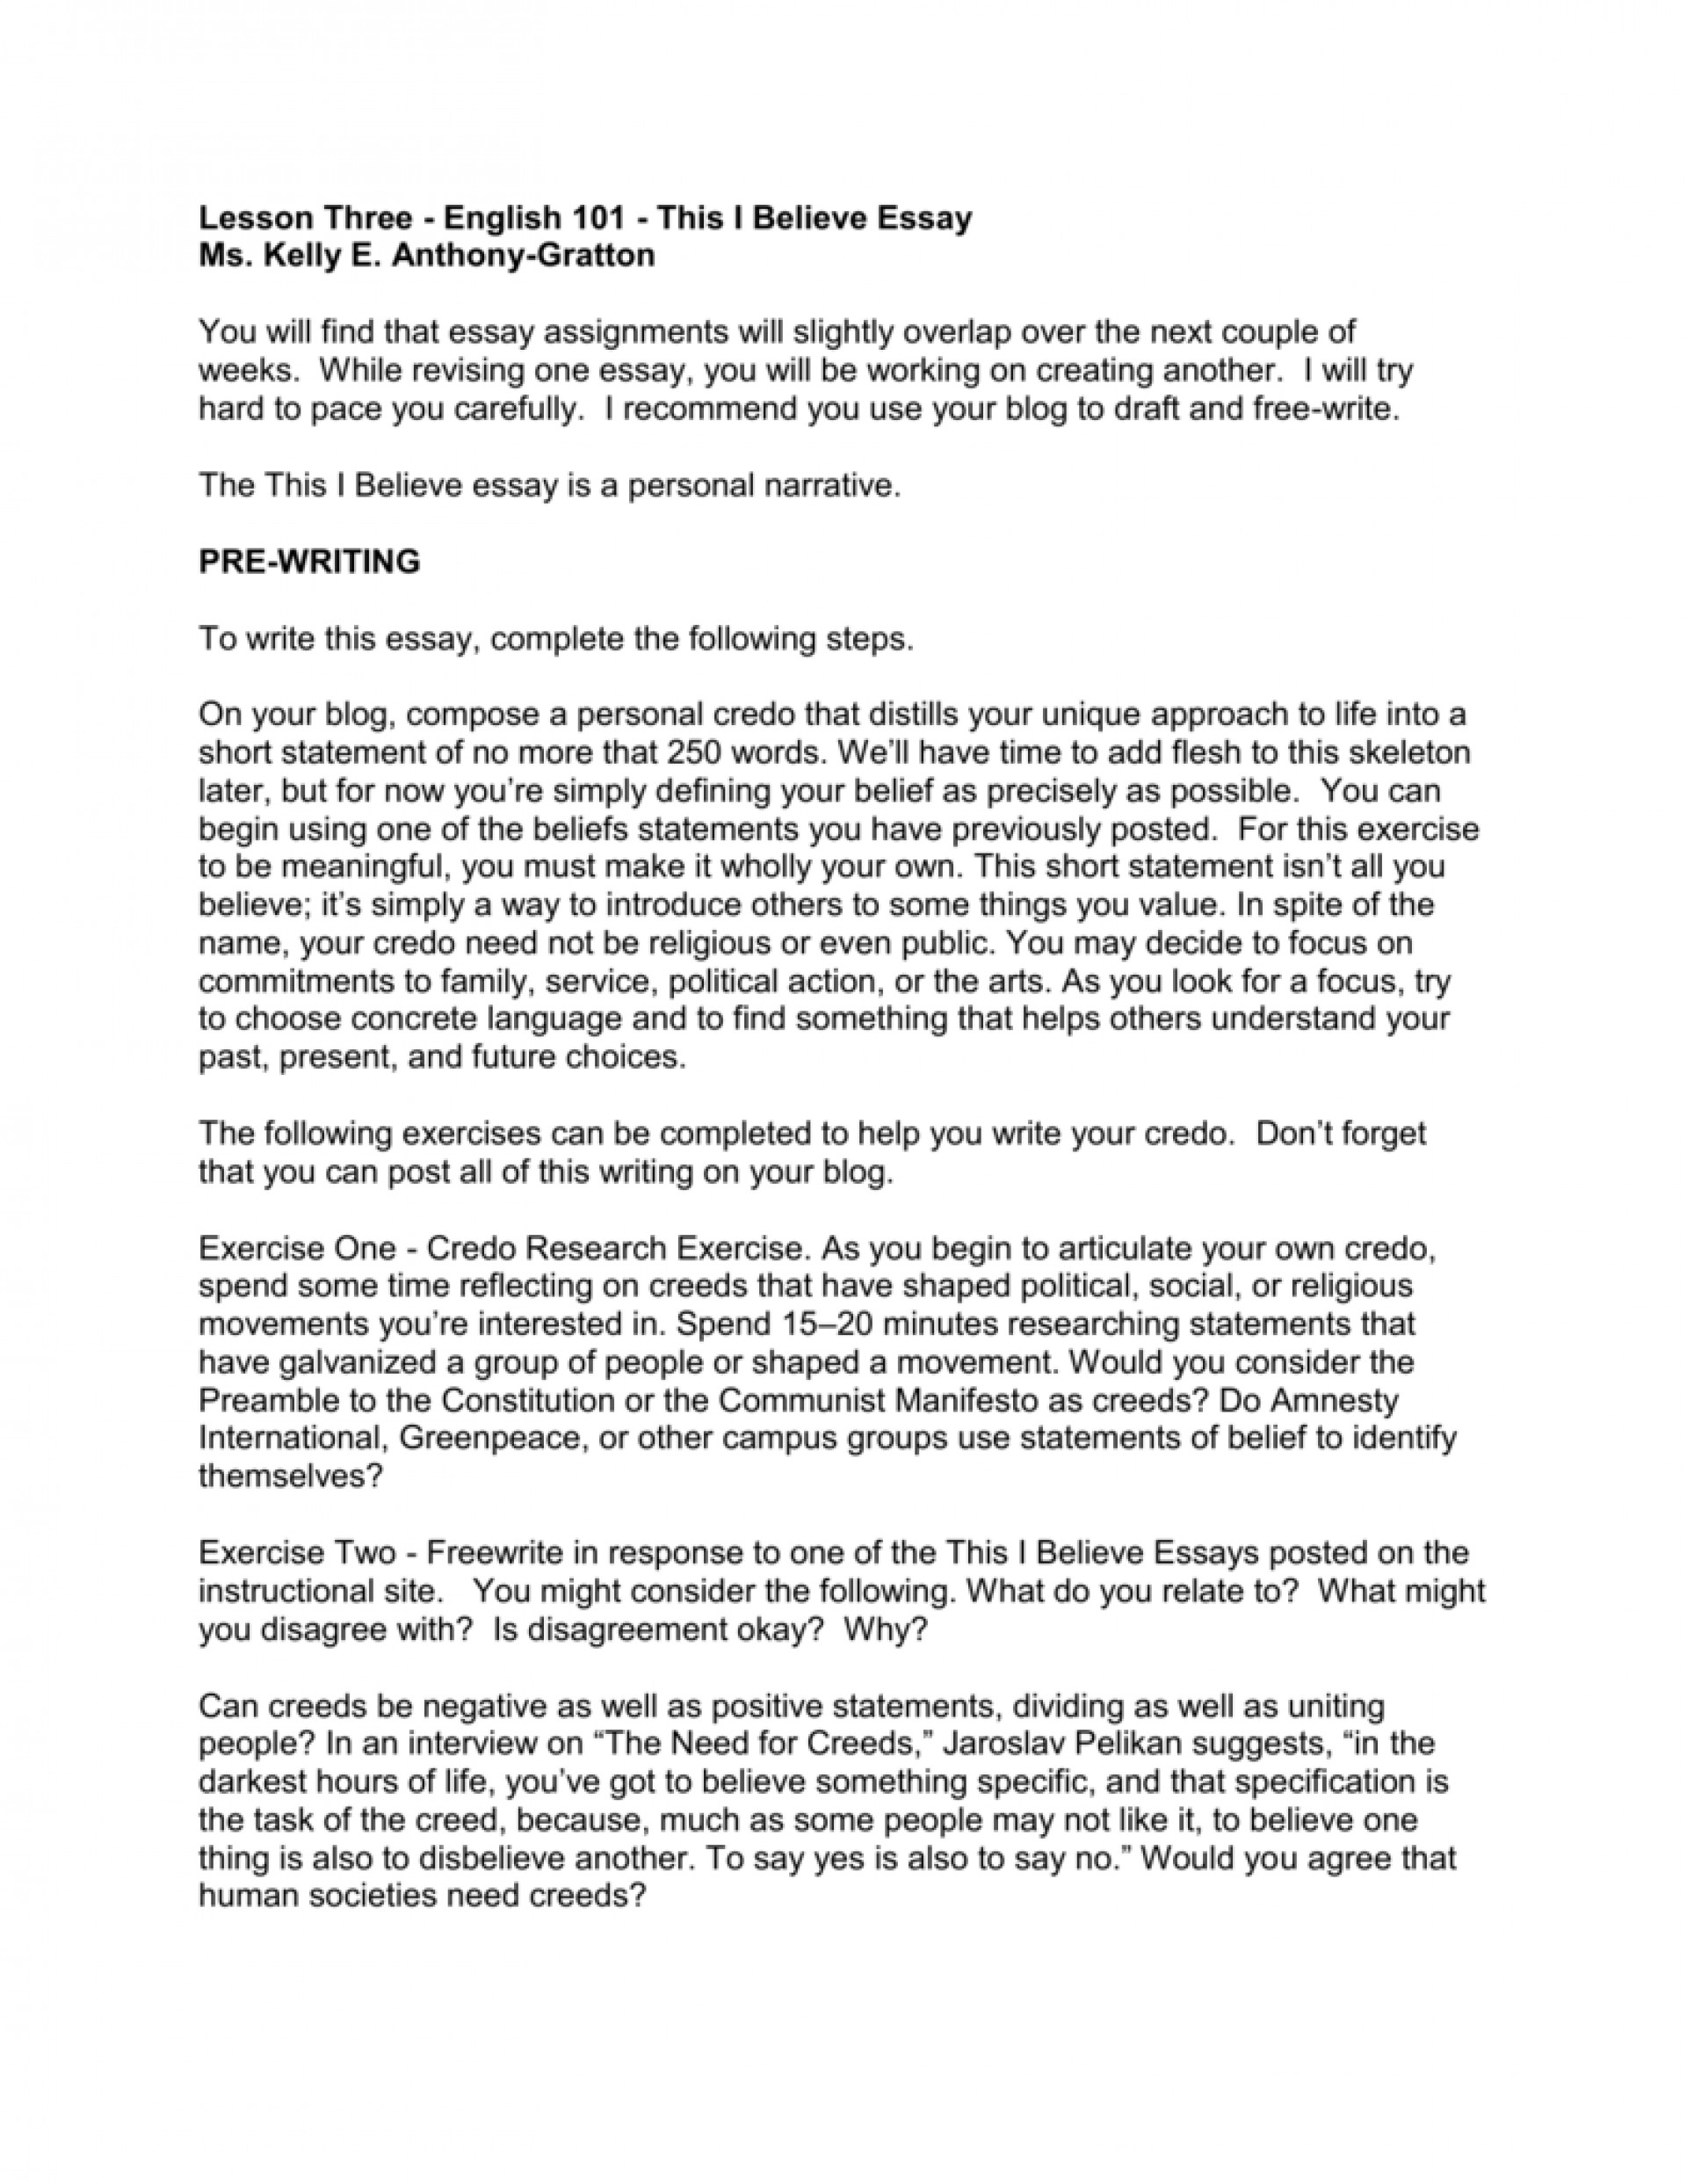 007 Essay Example This I Believe Examples 006667793 2 Stupendous Npr College 1920